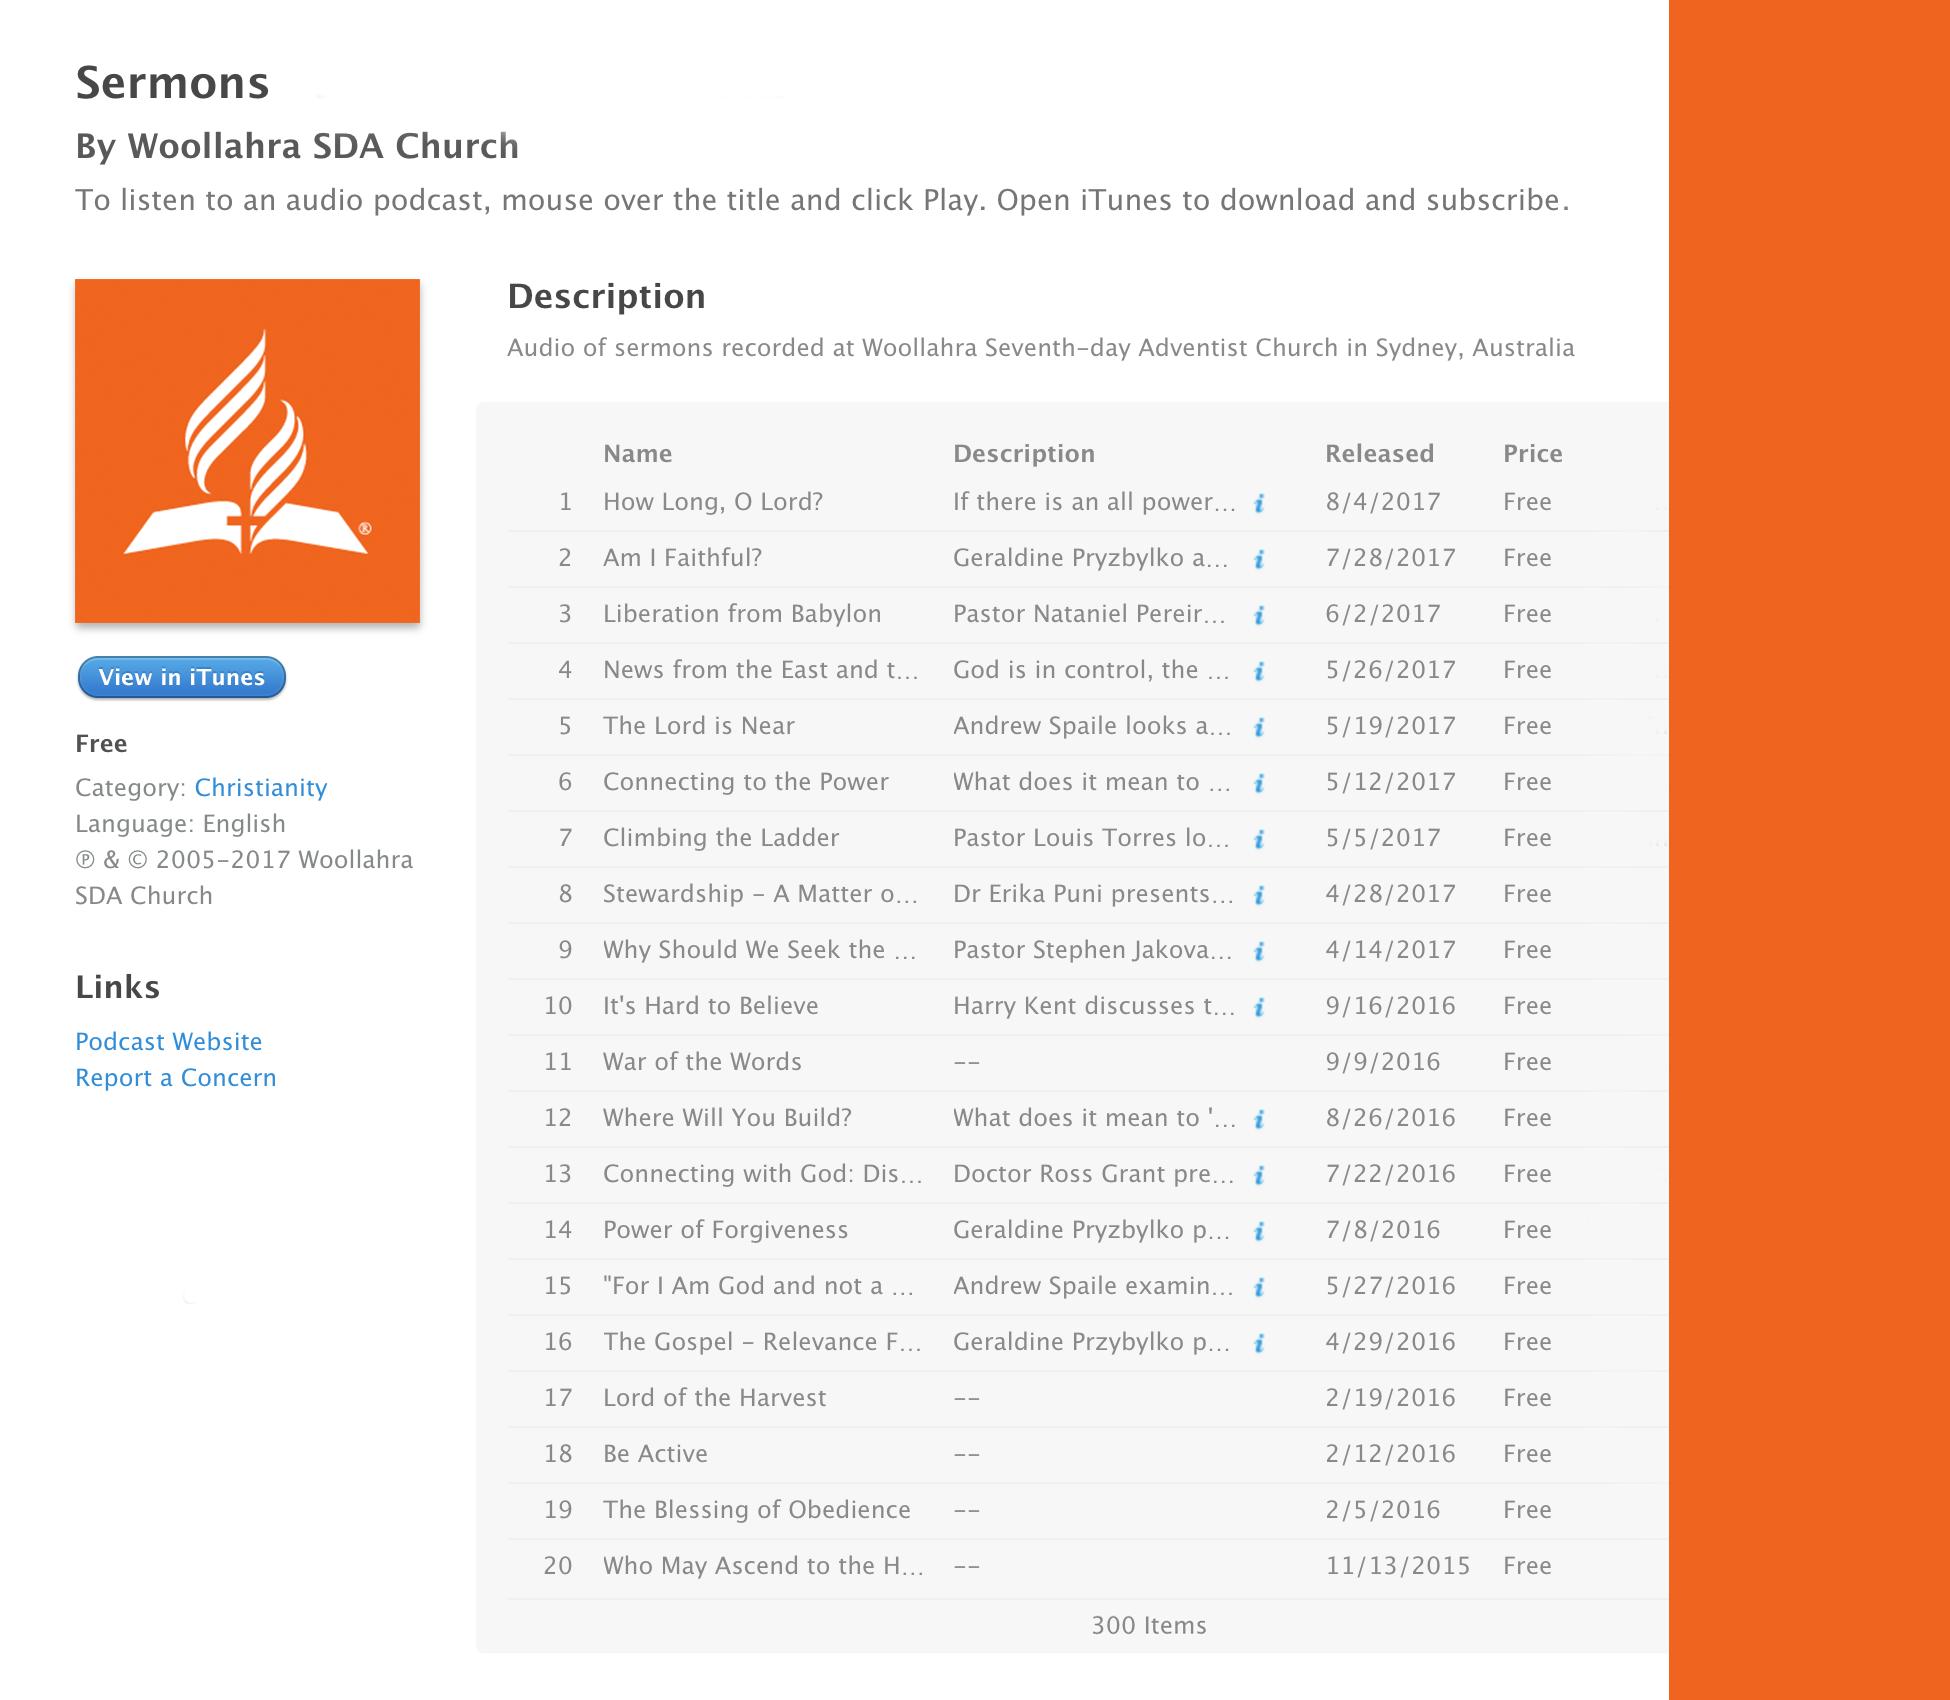 Sermons – Woollahra Seventh-day Adventist Church